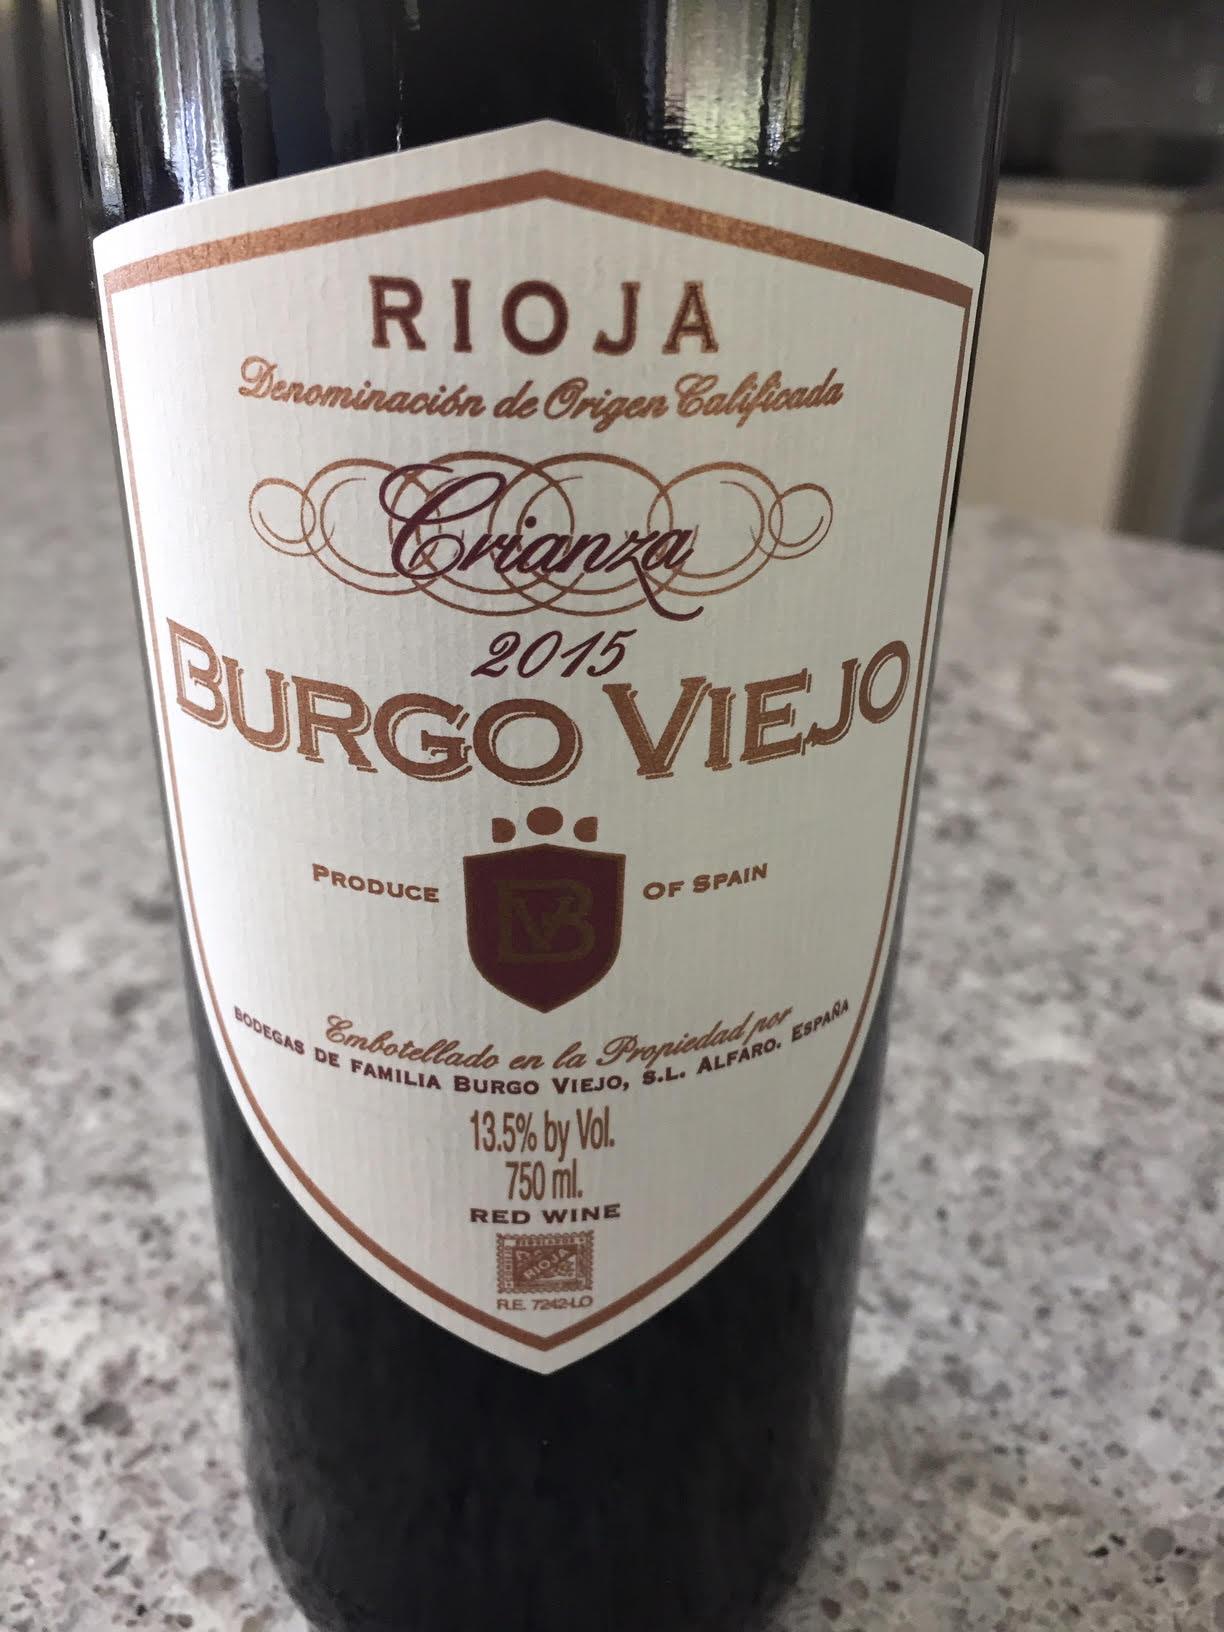 Episode 43: Rioja, Crianza Burgo Viejo